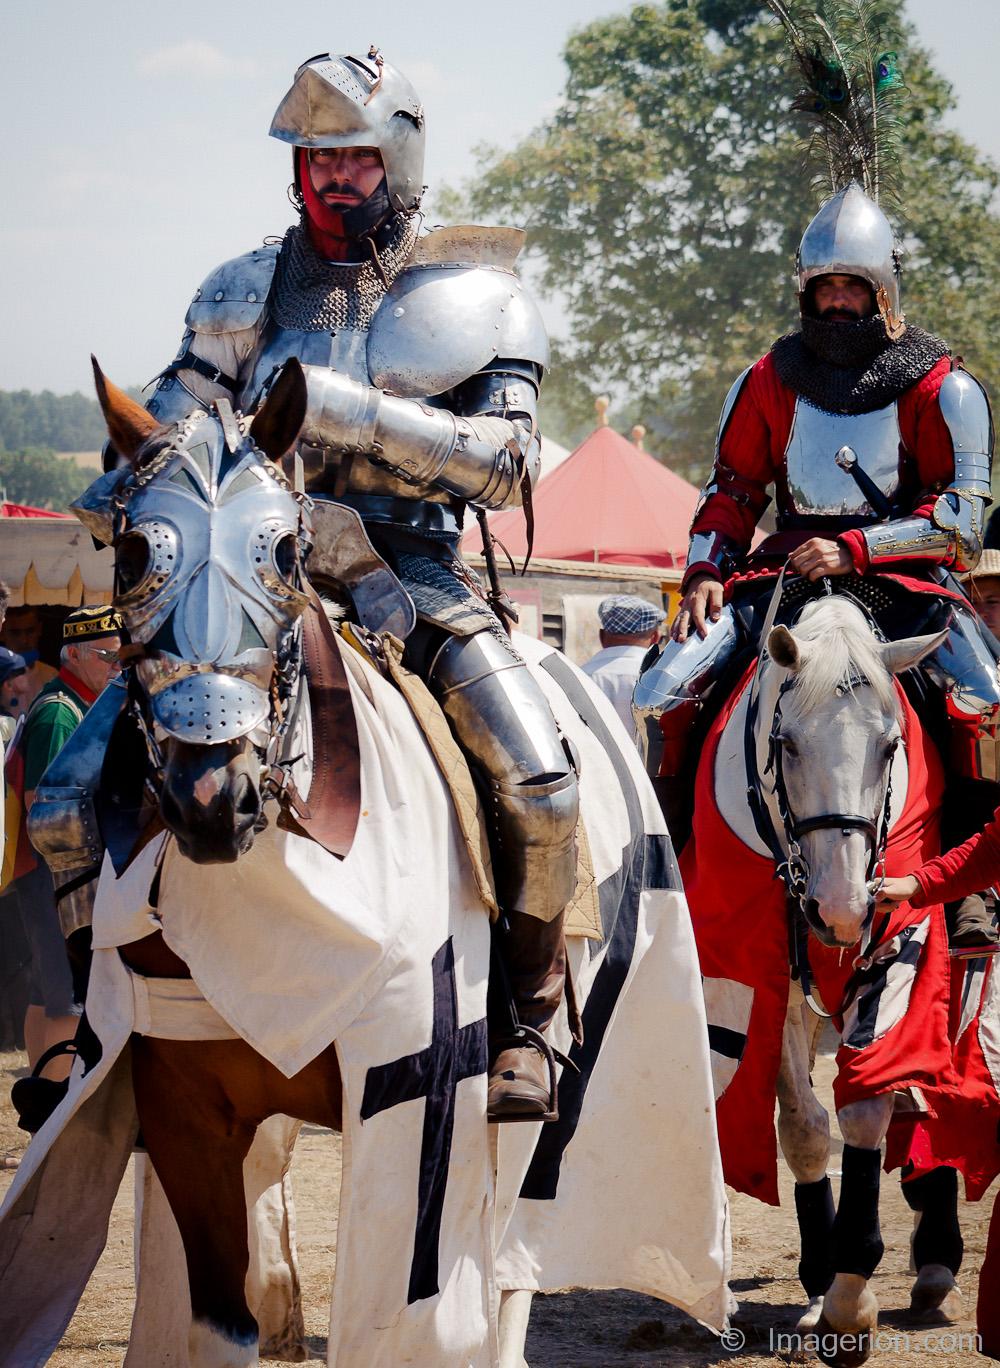 Teutons riding horseback, approaching